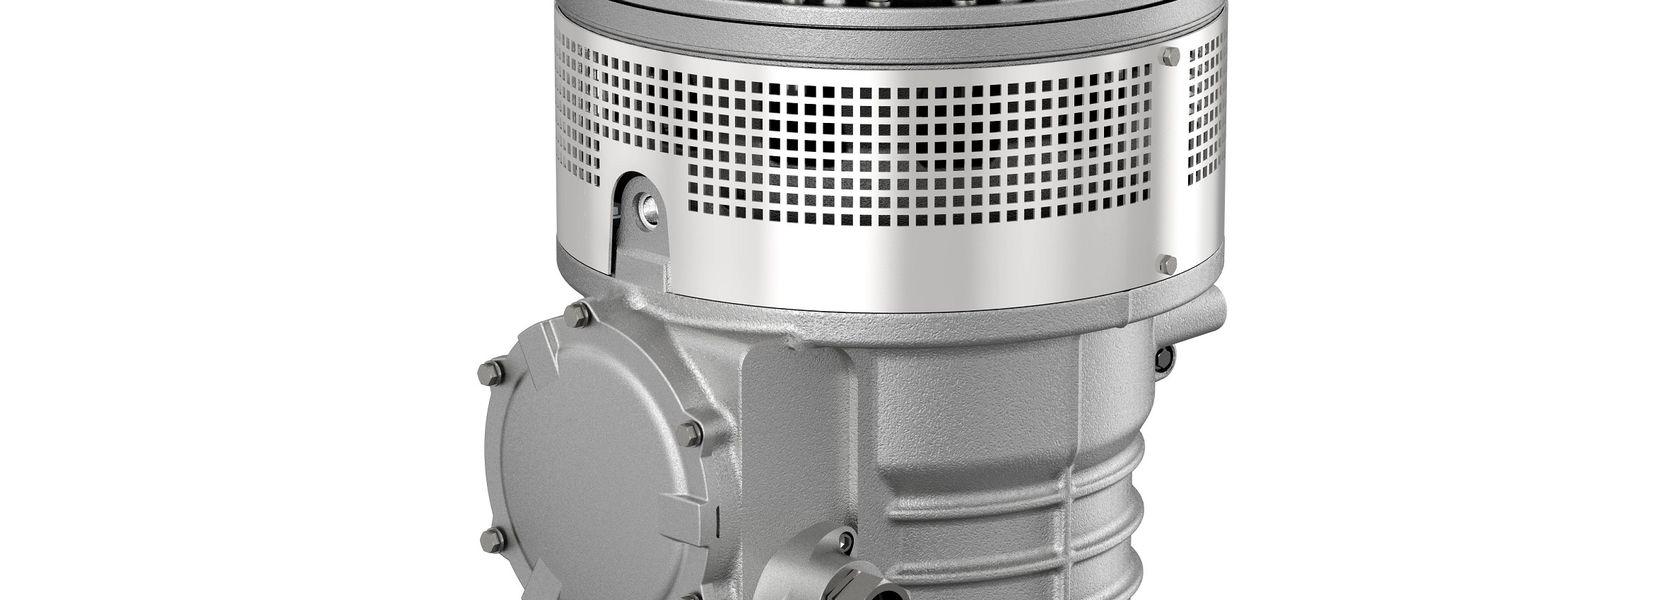 Xylem upgrades Flygt 2000 pumps - Mining Magazine